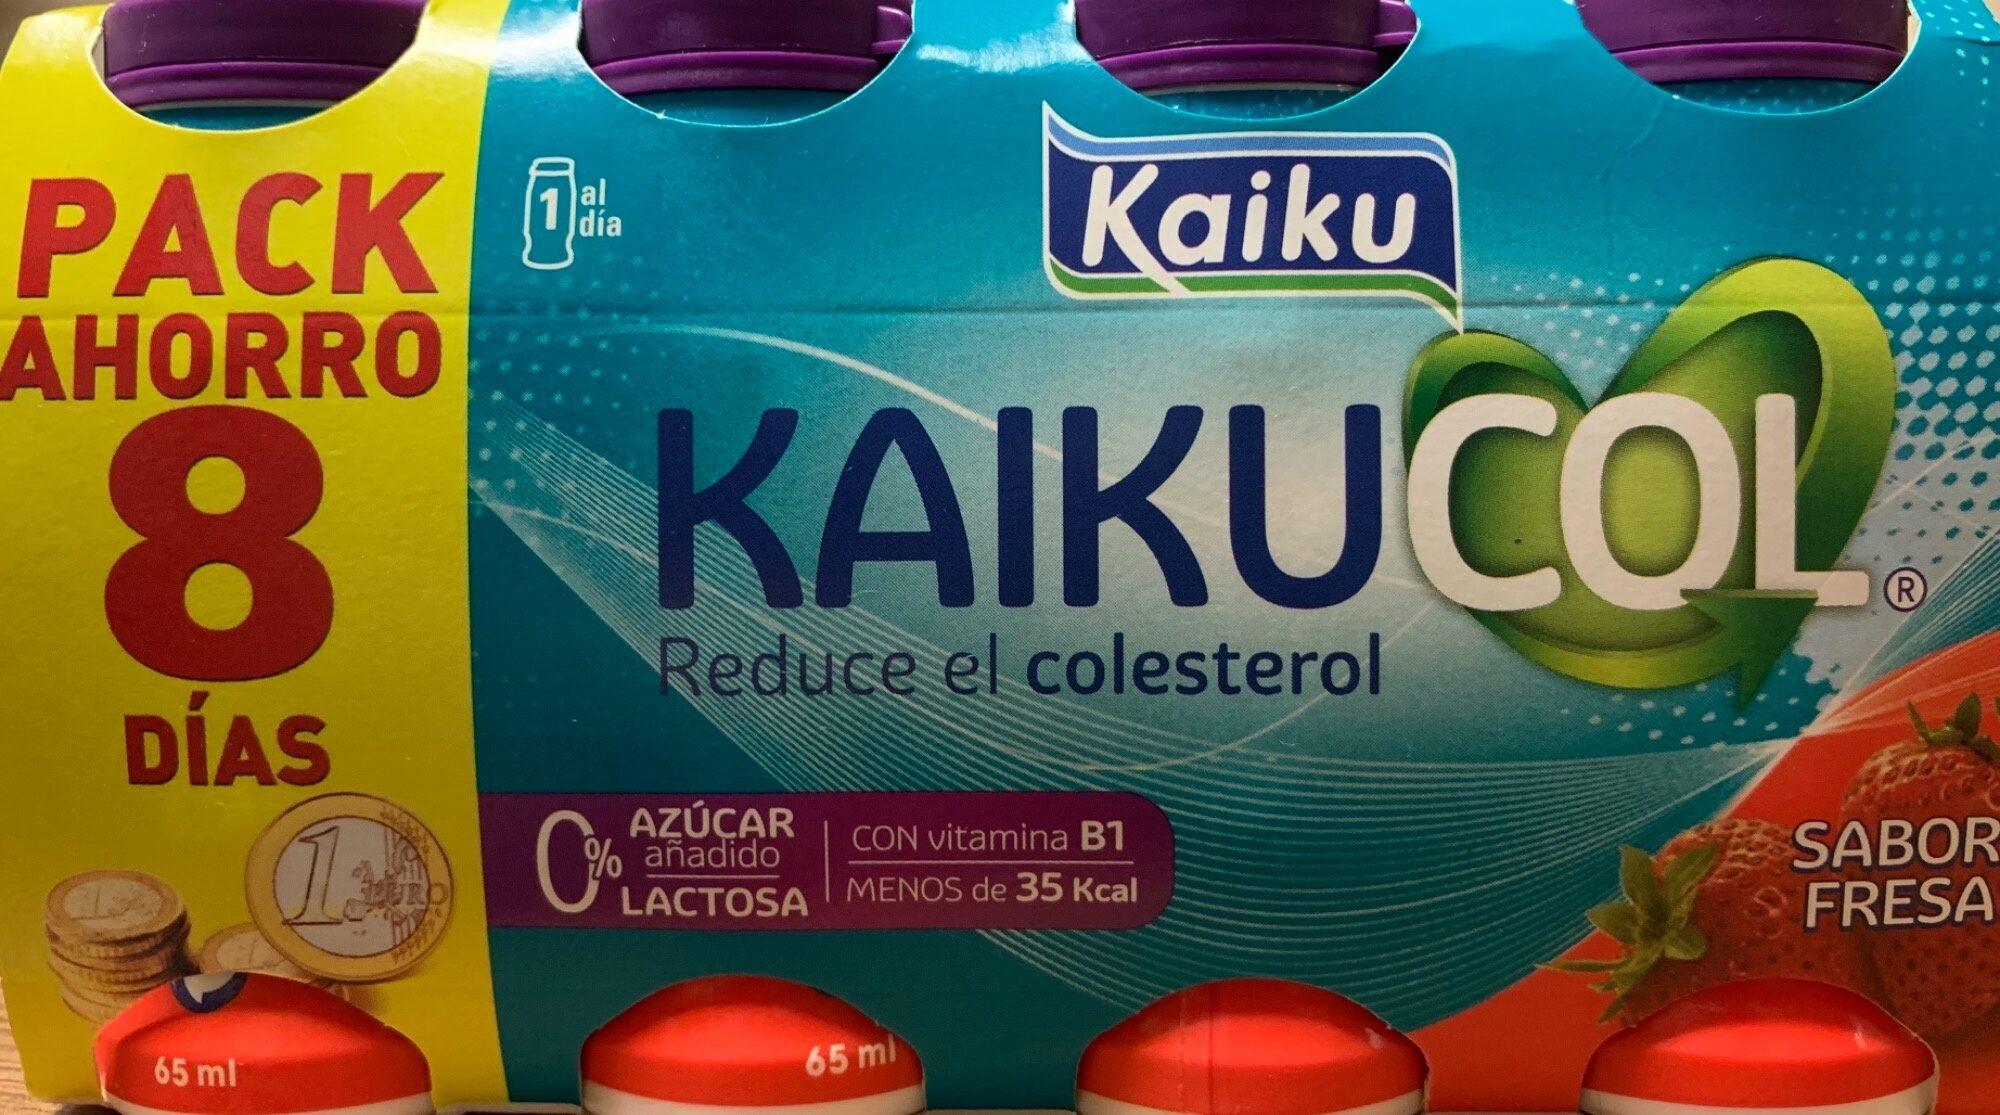 Kaikucol sabor fresa - Product - es